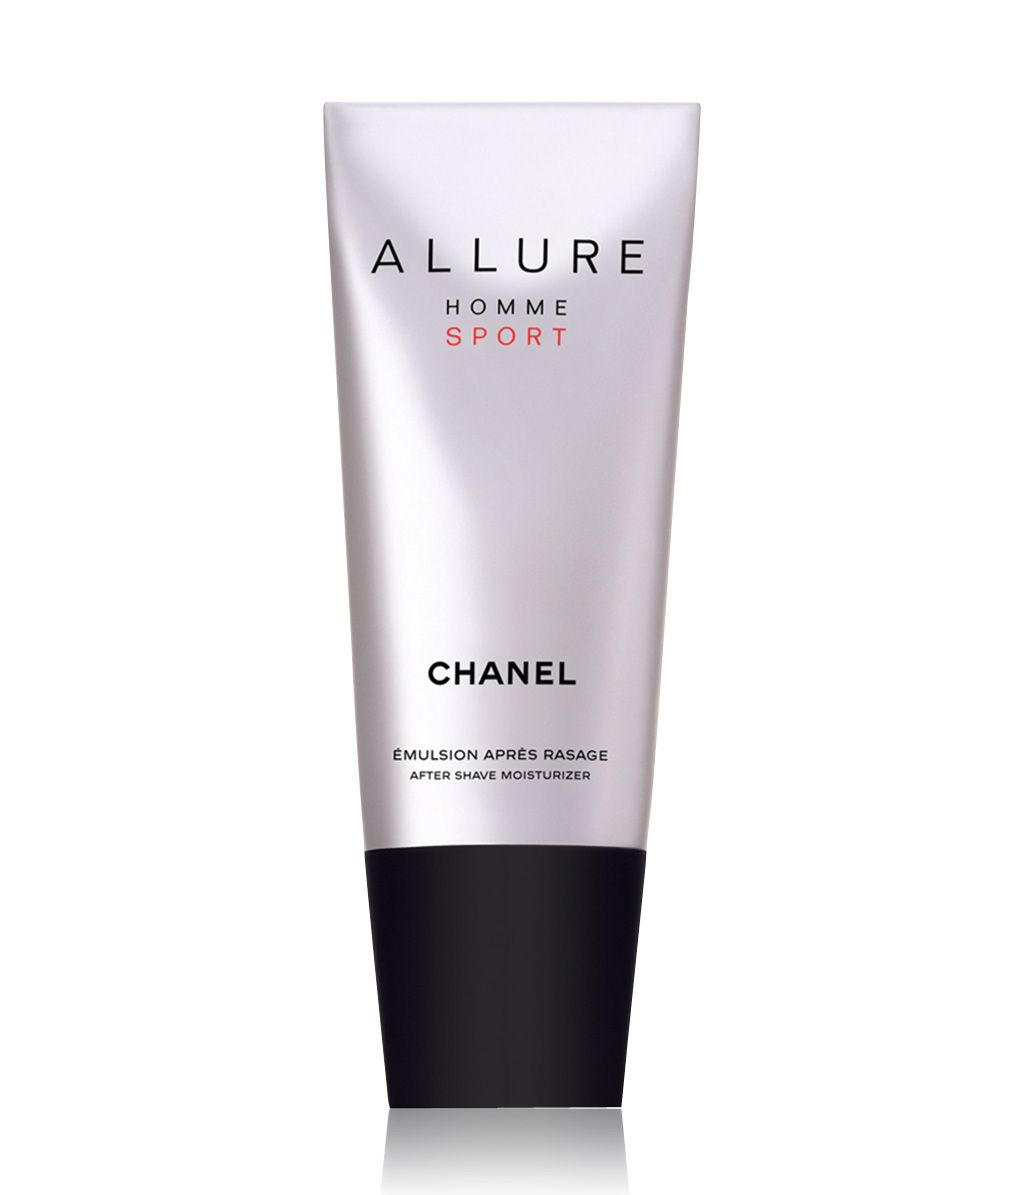 Chanel Allure Homme Sport After Shave Balsam Online Bestellen